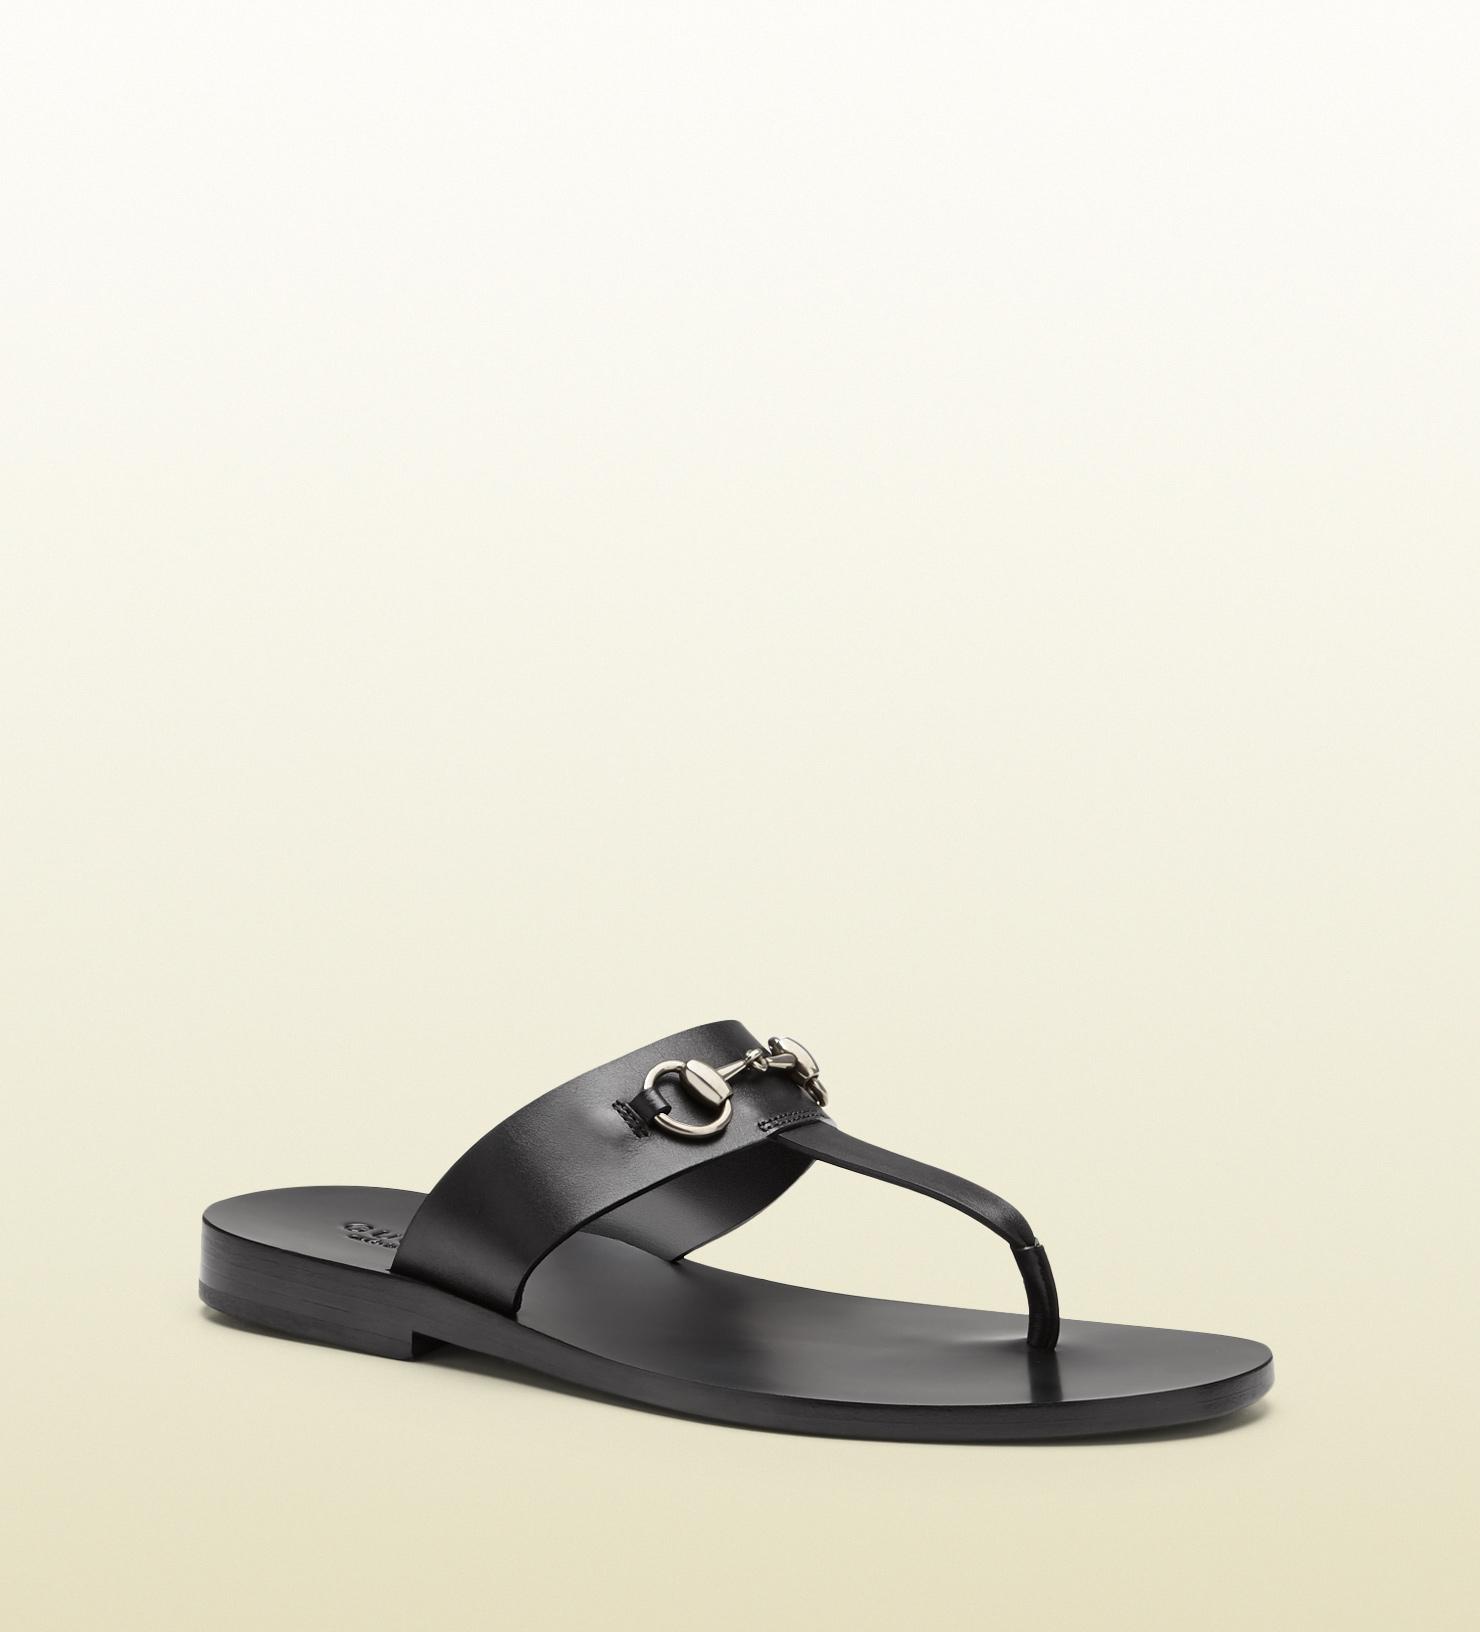 11f7a1a61544 Lyst - Gucci Leather Horsebit Thong Sandal in Black